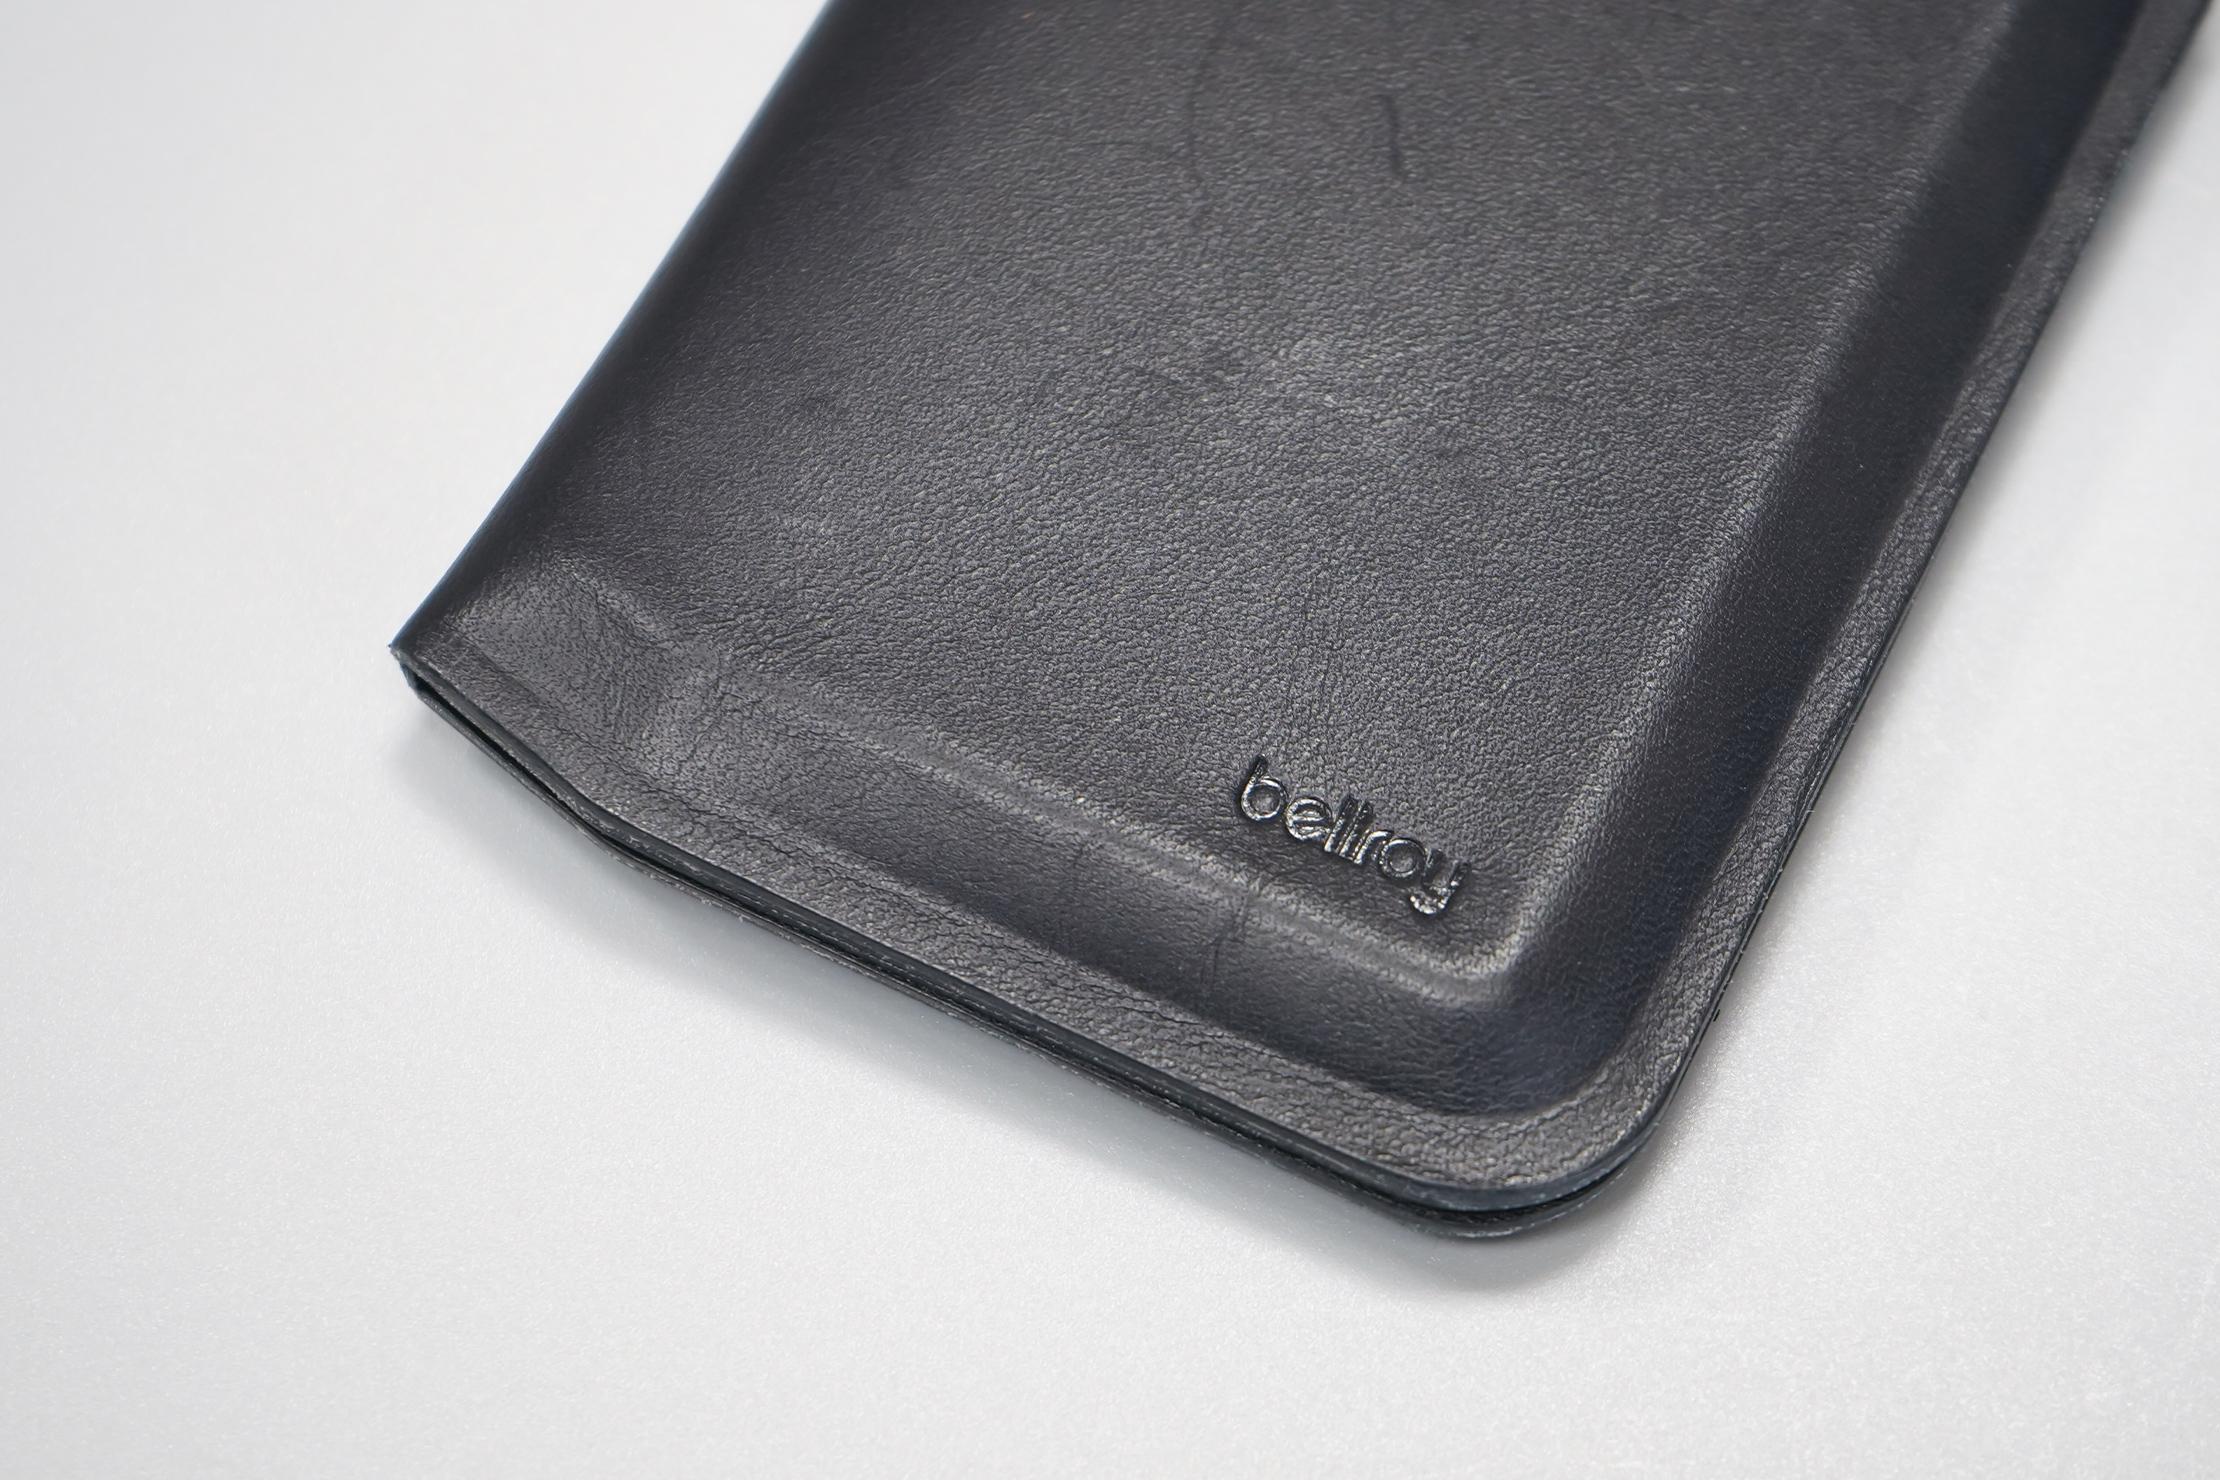 Bellroy Apex Slim Sleeve | Leather material & logo